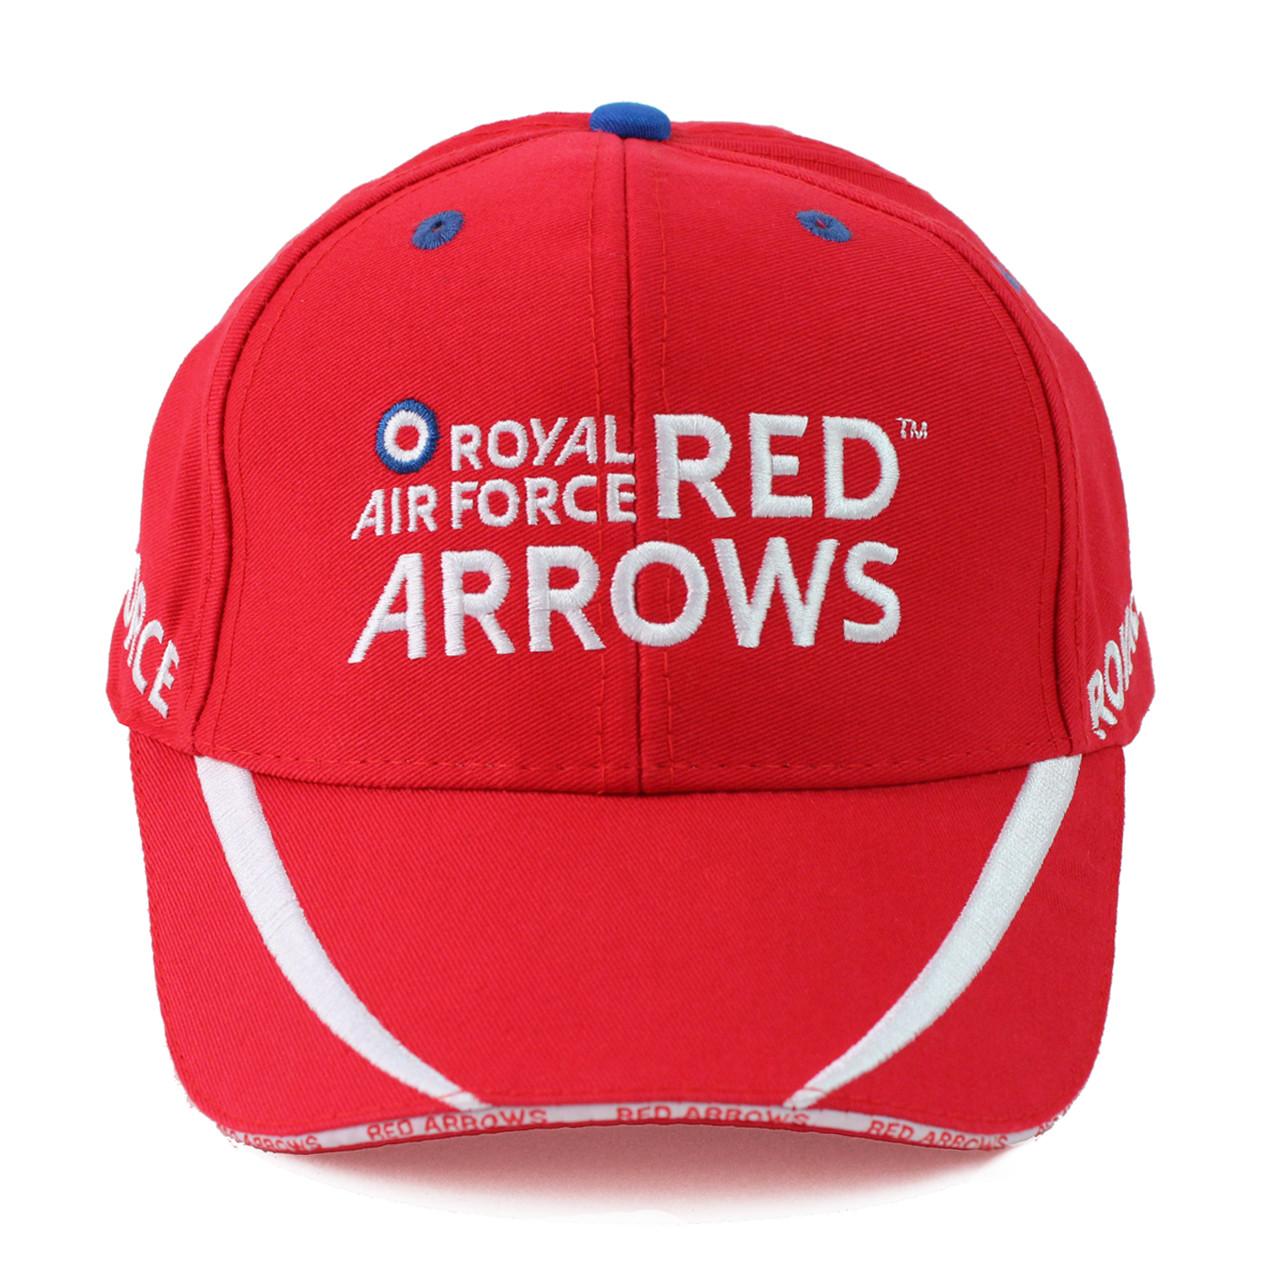 Official Red Arrows Adult Baseball Cap bdf67040bc2